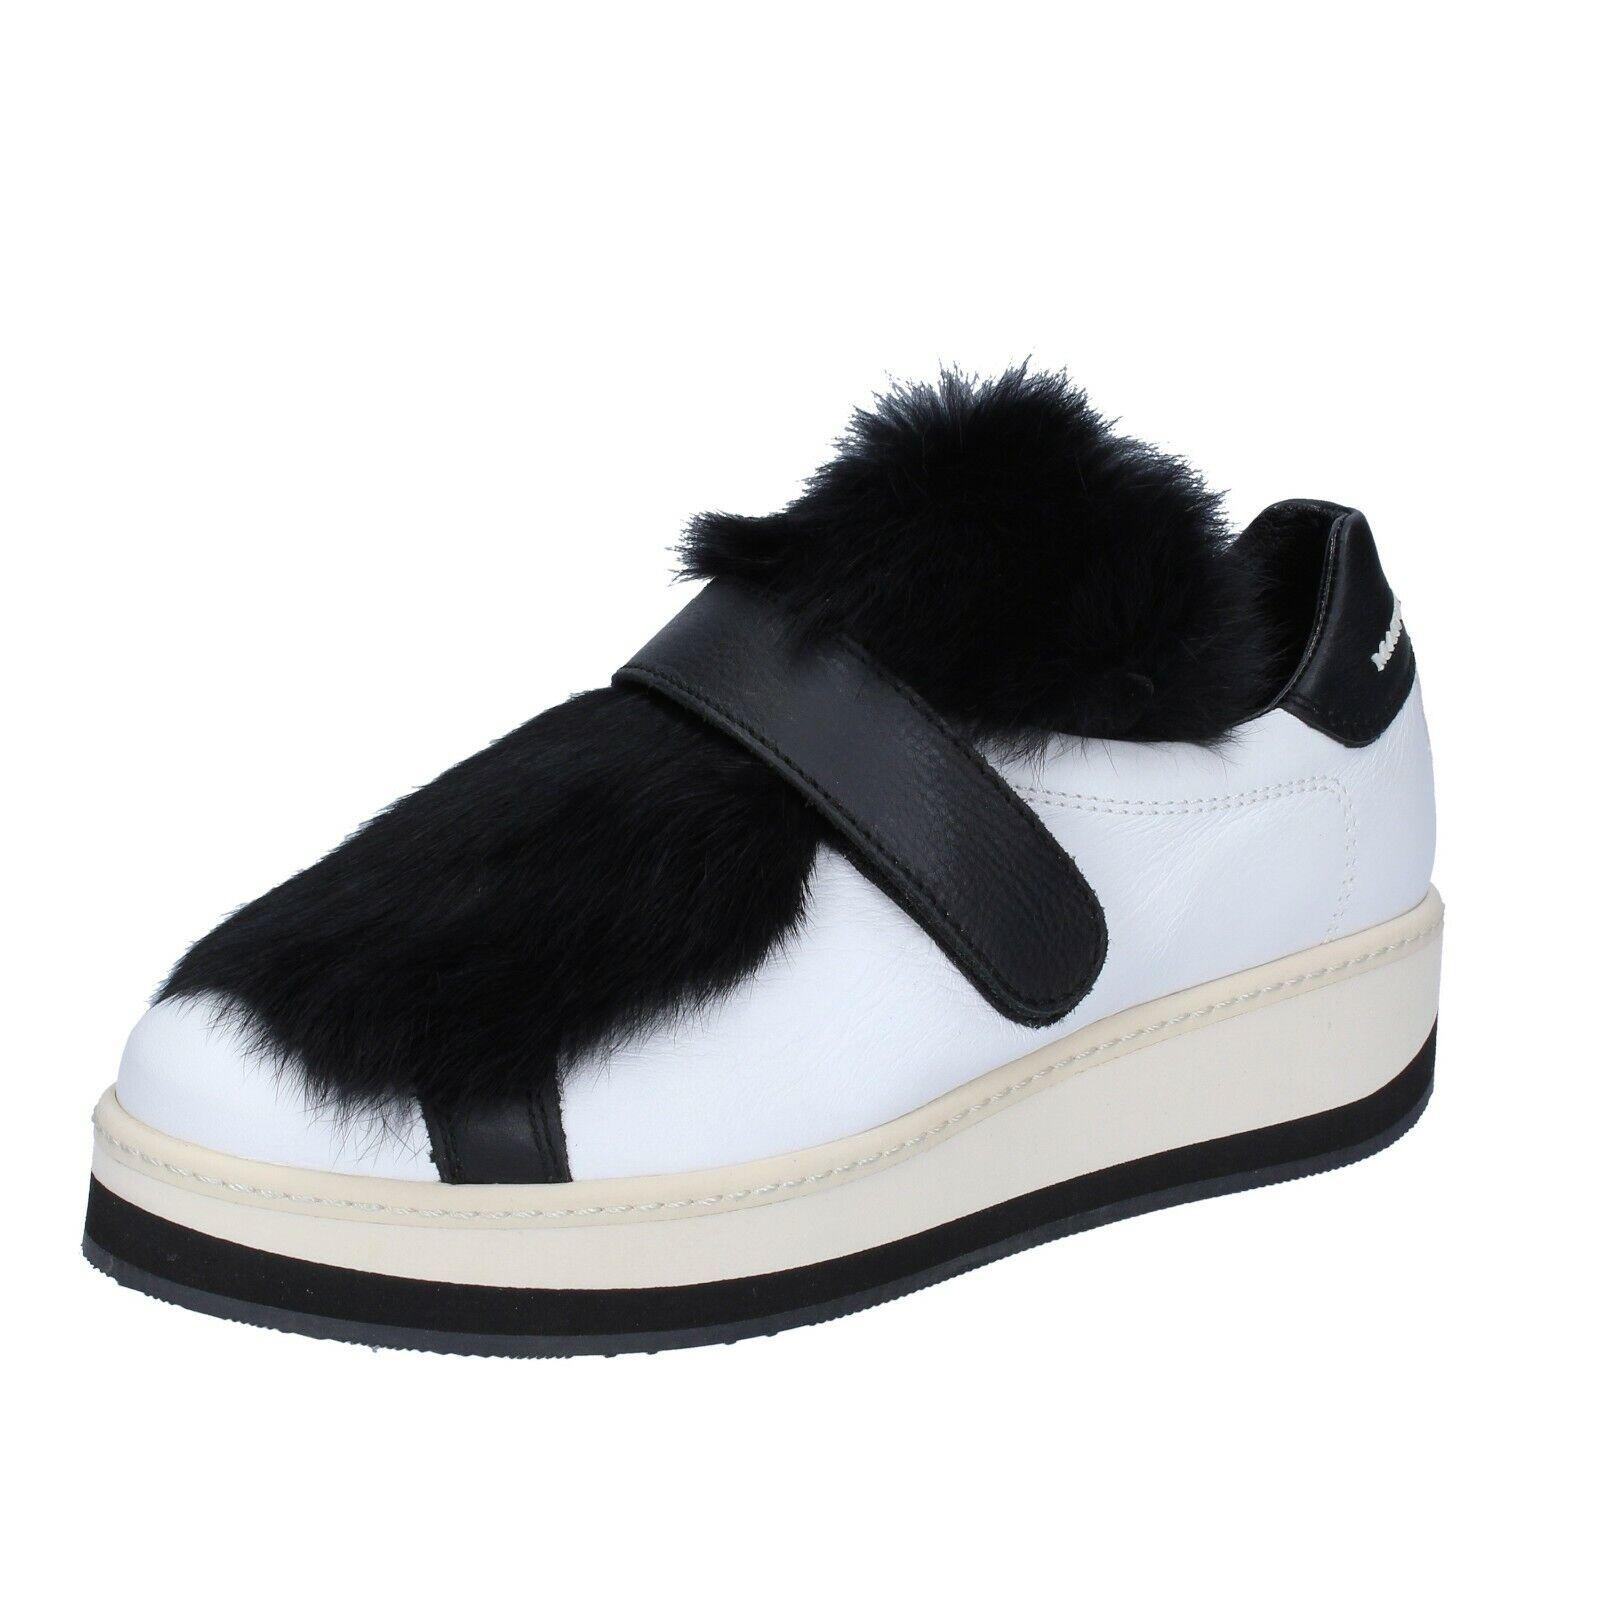 Scarpe donna MANUEL BARCELO 40 EU scarpe da ginnastica nero bianco pelle BS330-40